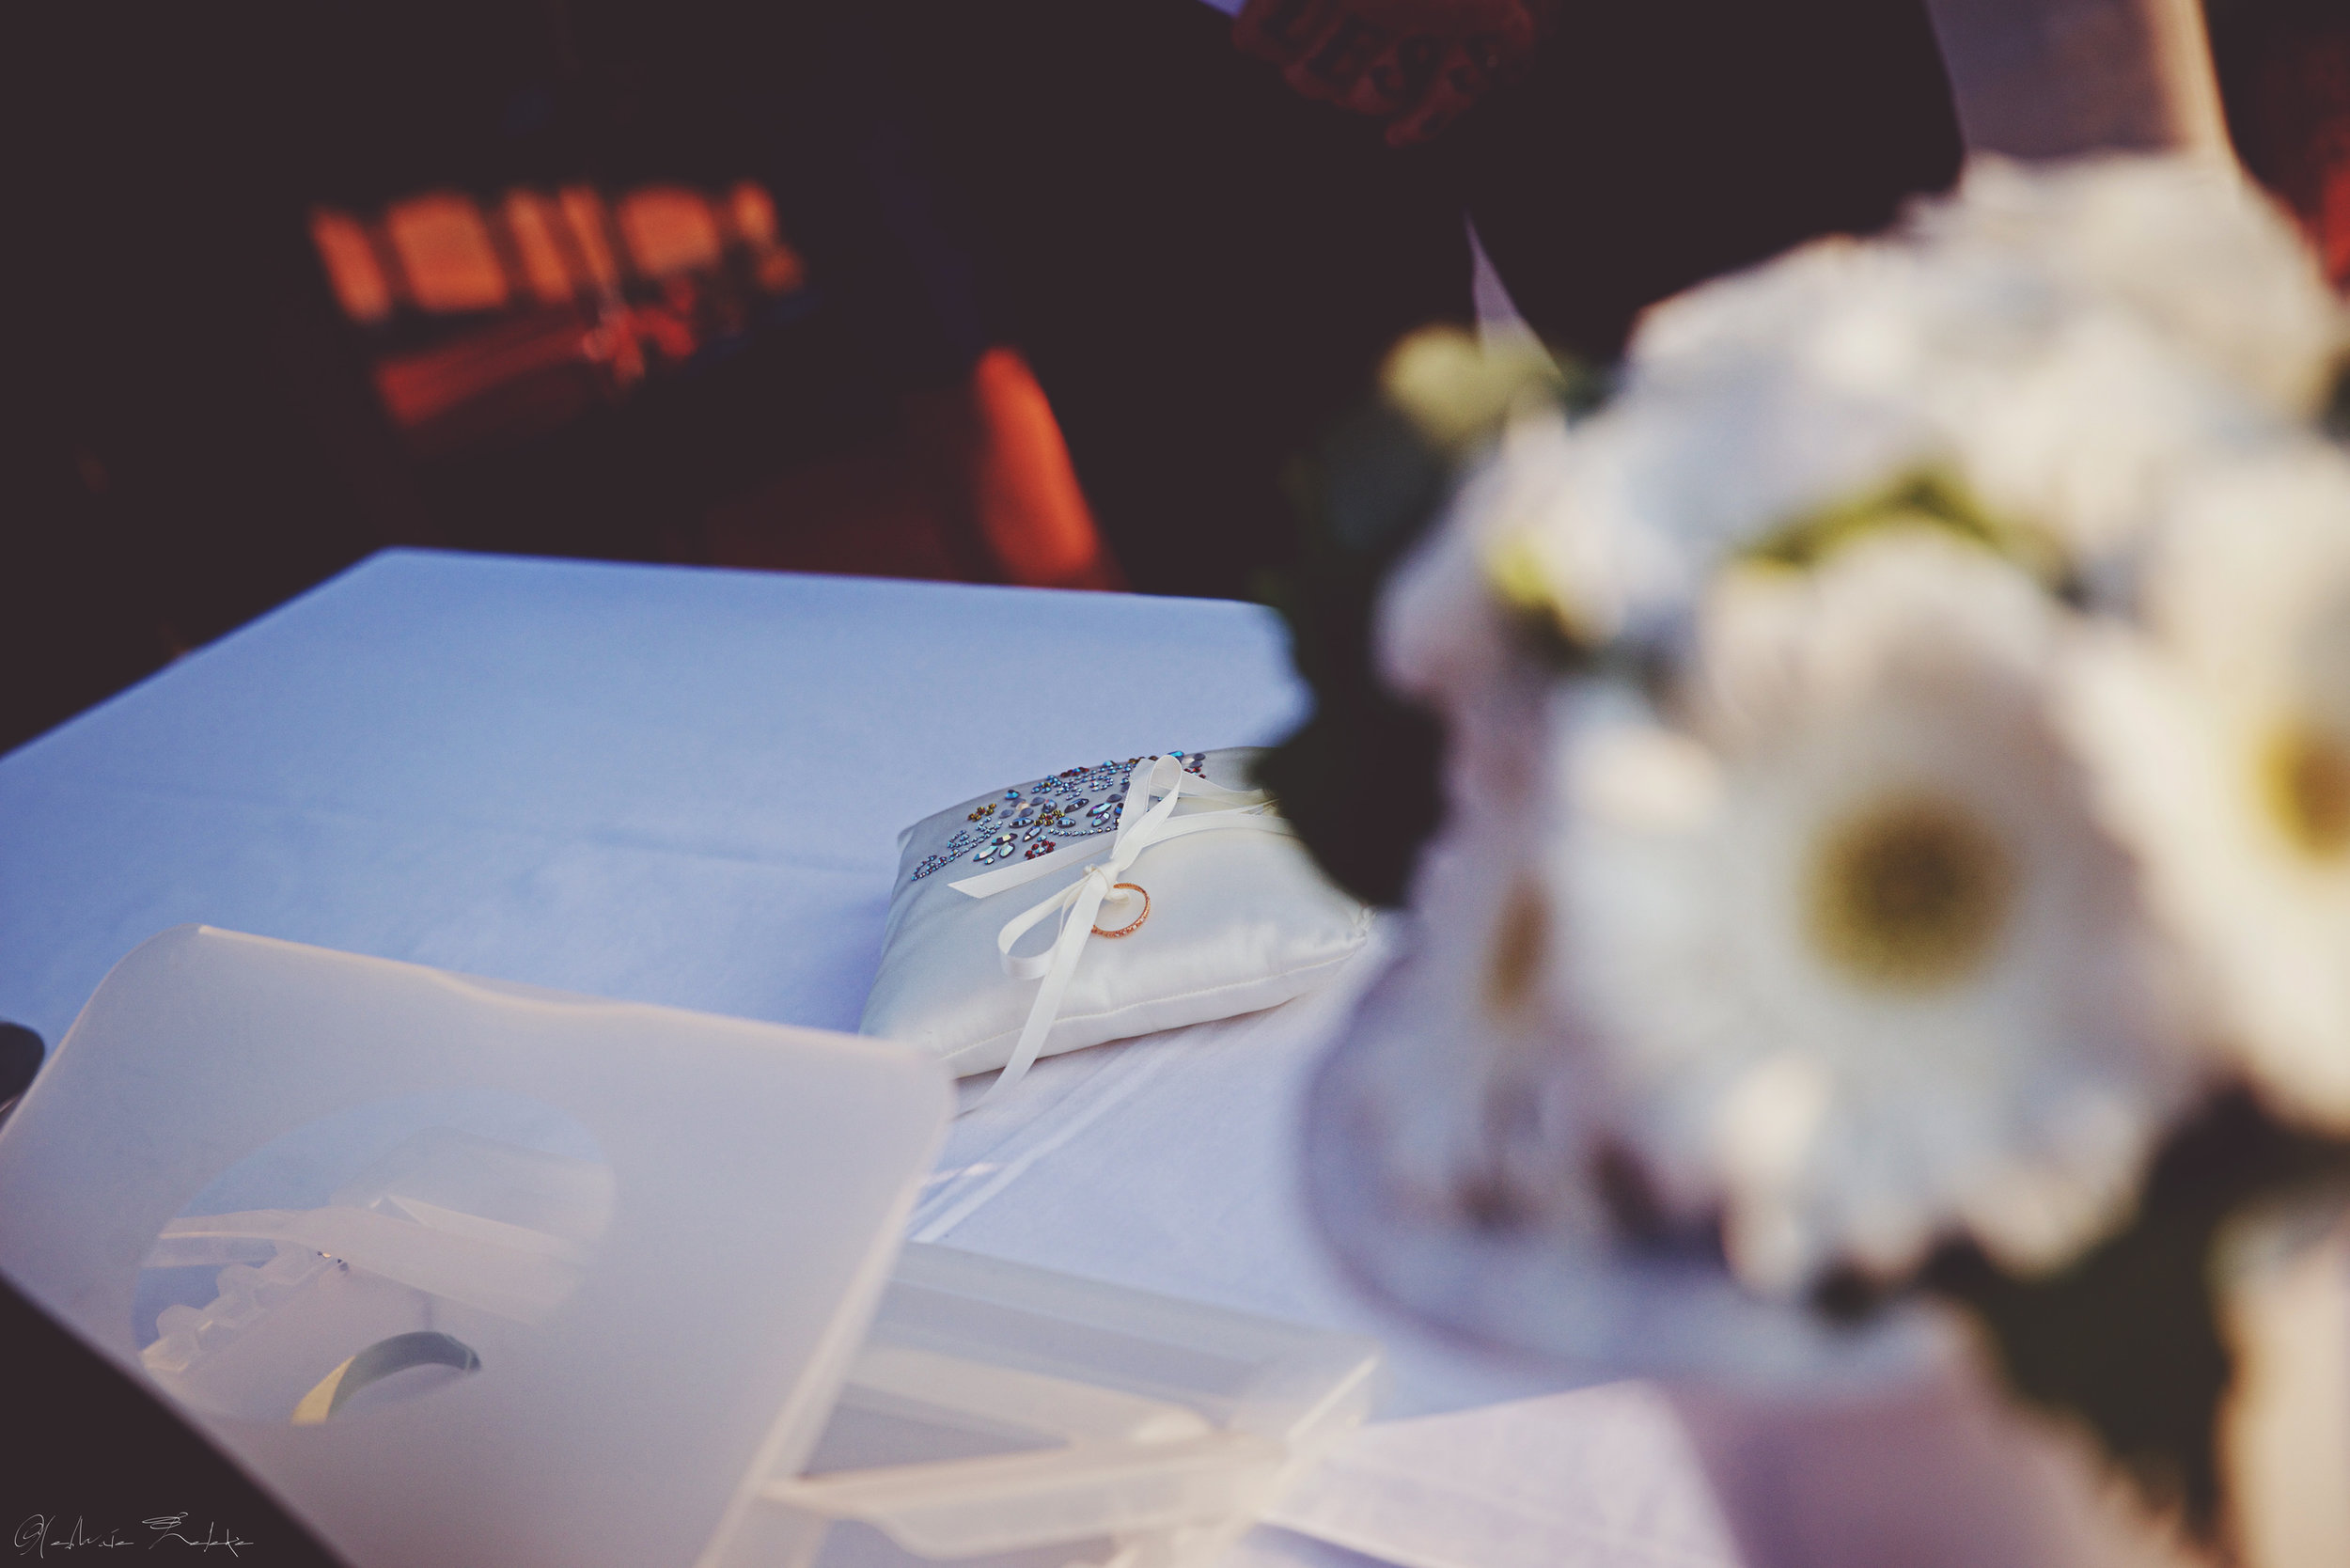 Cassidy-Ryan-Wedding-Florence-82.jpg